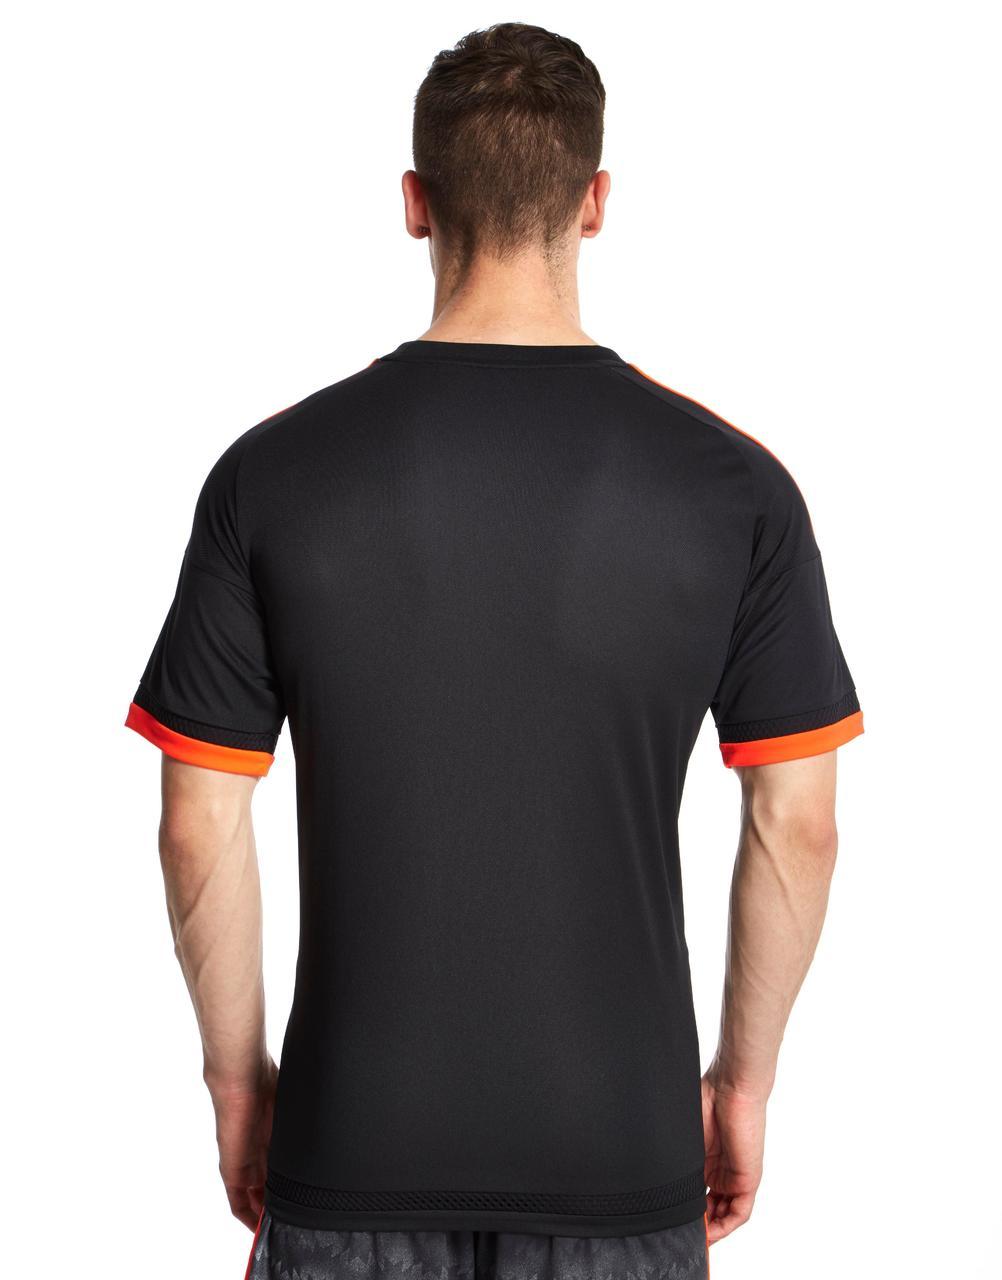 3735ebddc Man Utd Football Shirt 2015 – EDGE Engineering and Consulting Limited